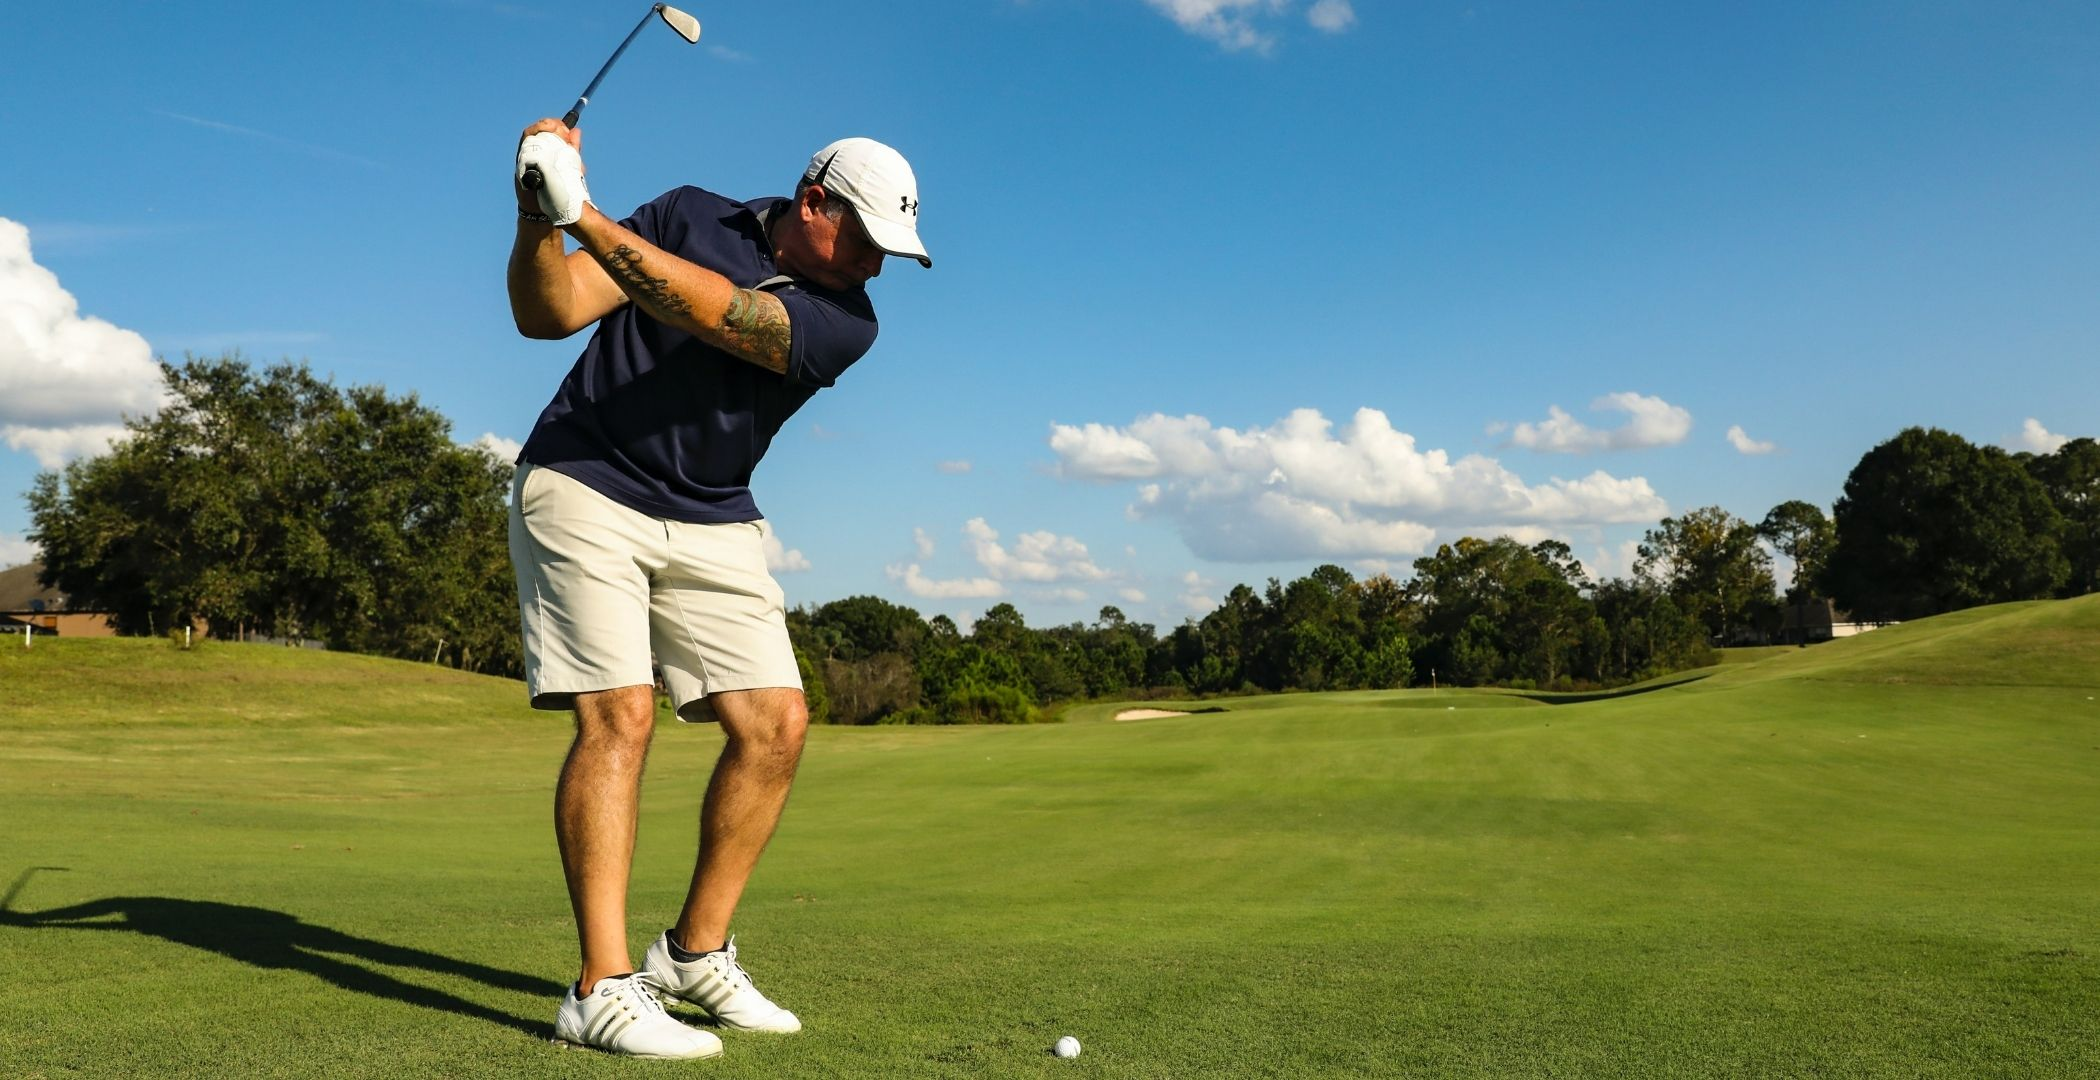 Golf App SCHALA announces partnership with Collctiv